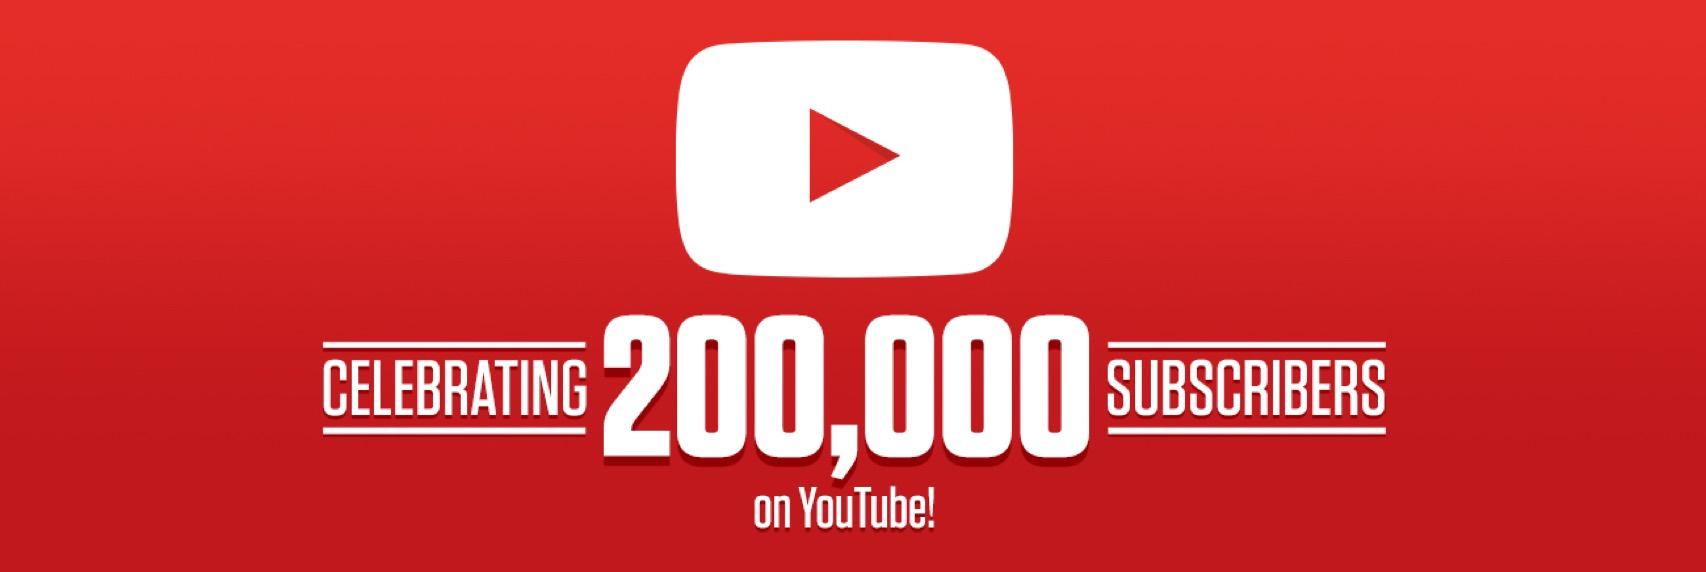 Adafruit Youtube 200K Hero